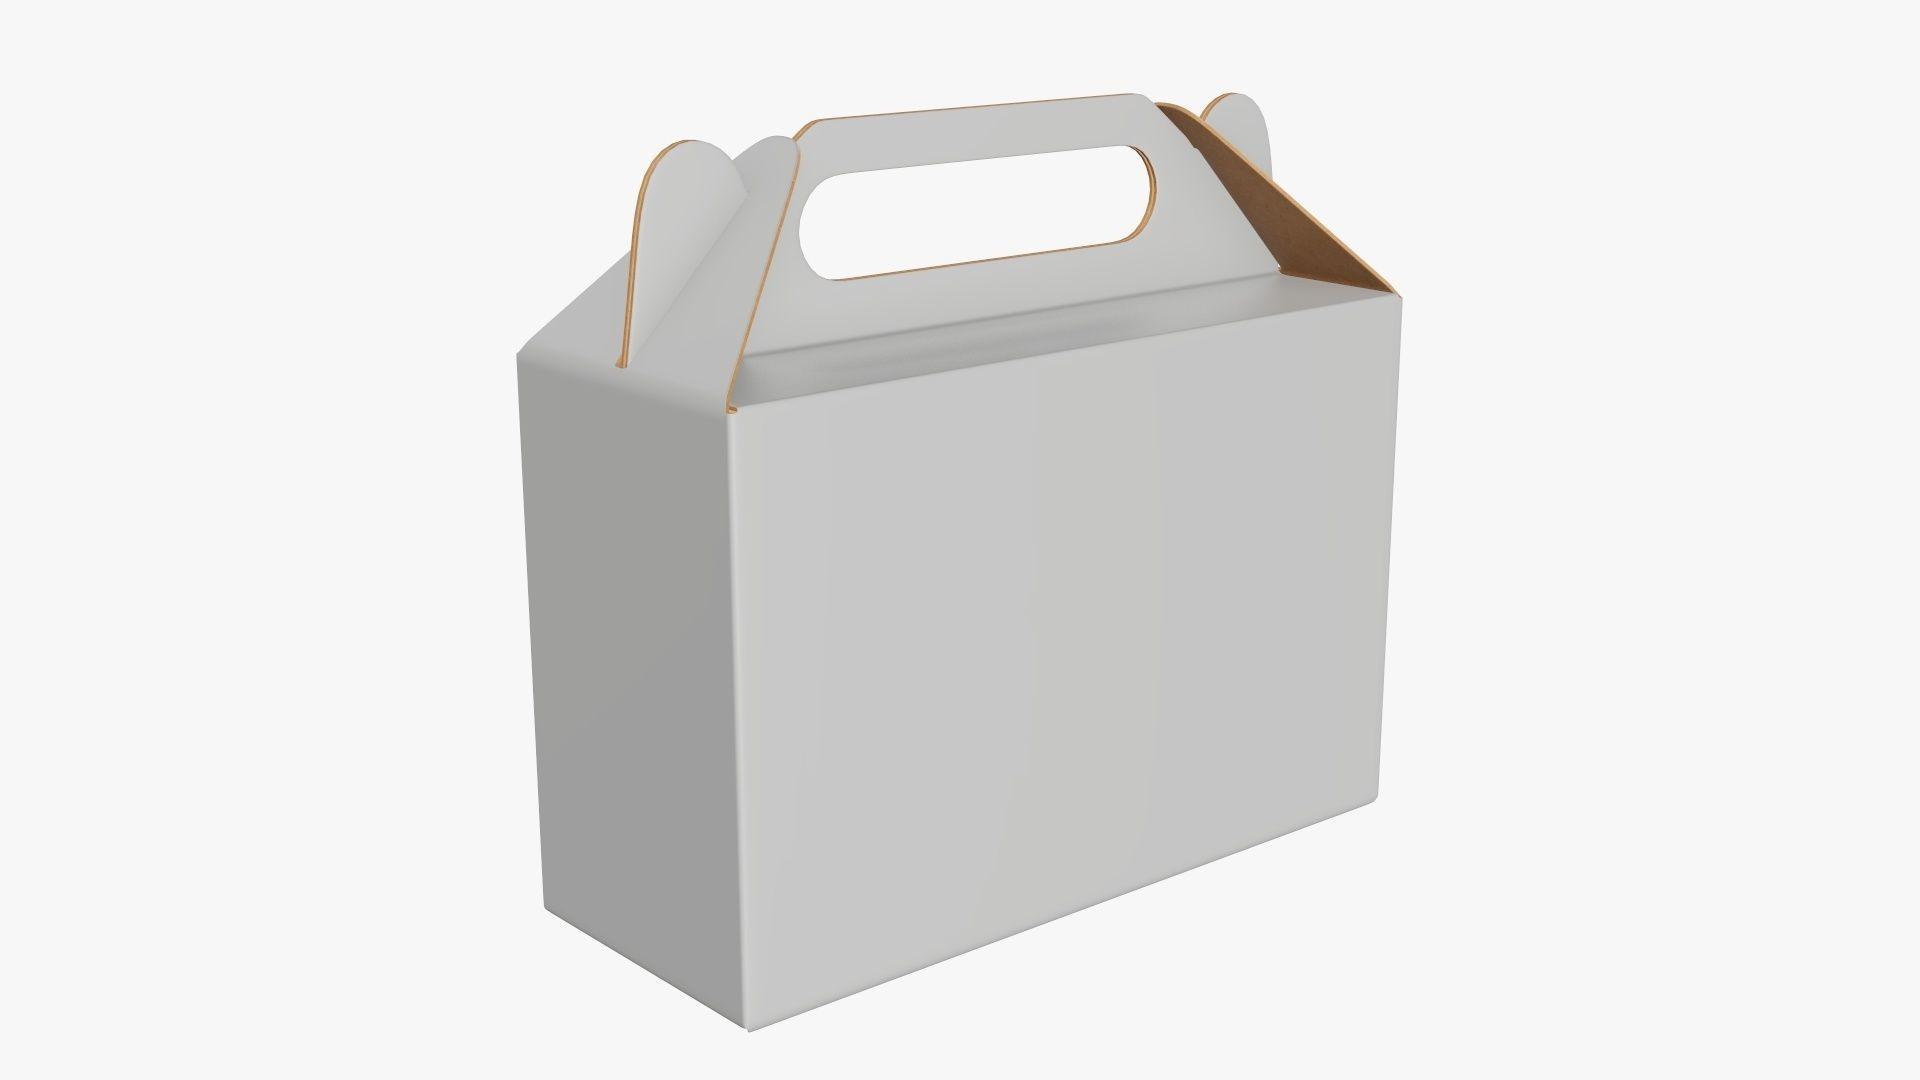 Gable box cardboard food packing 06 white